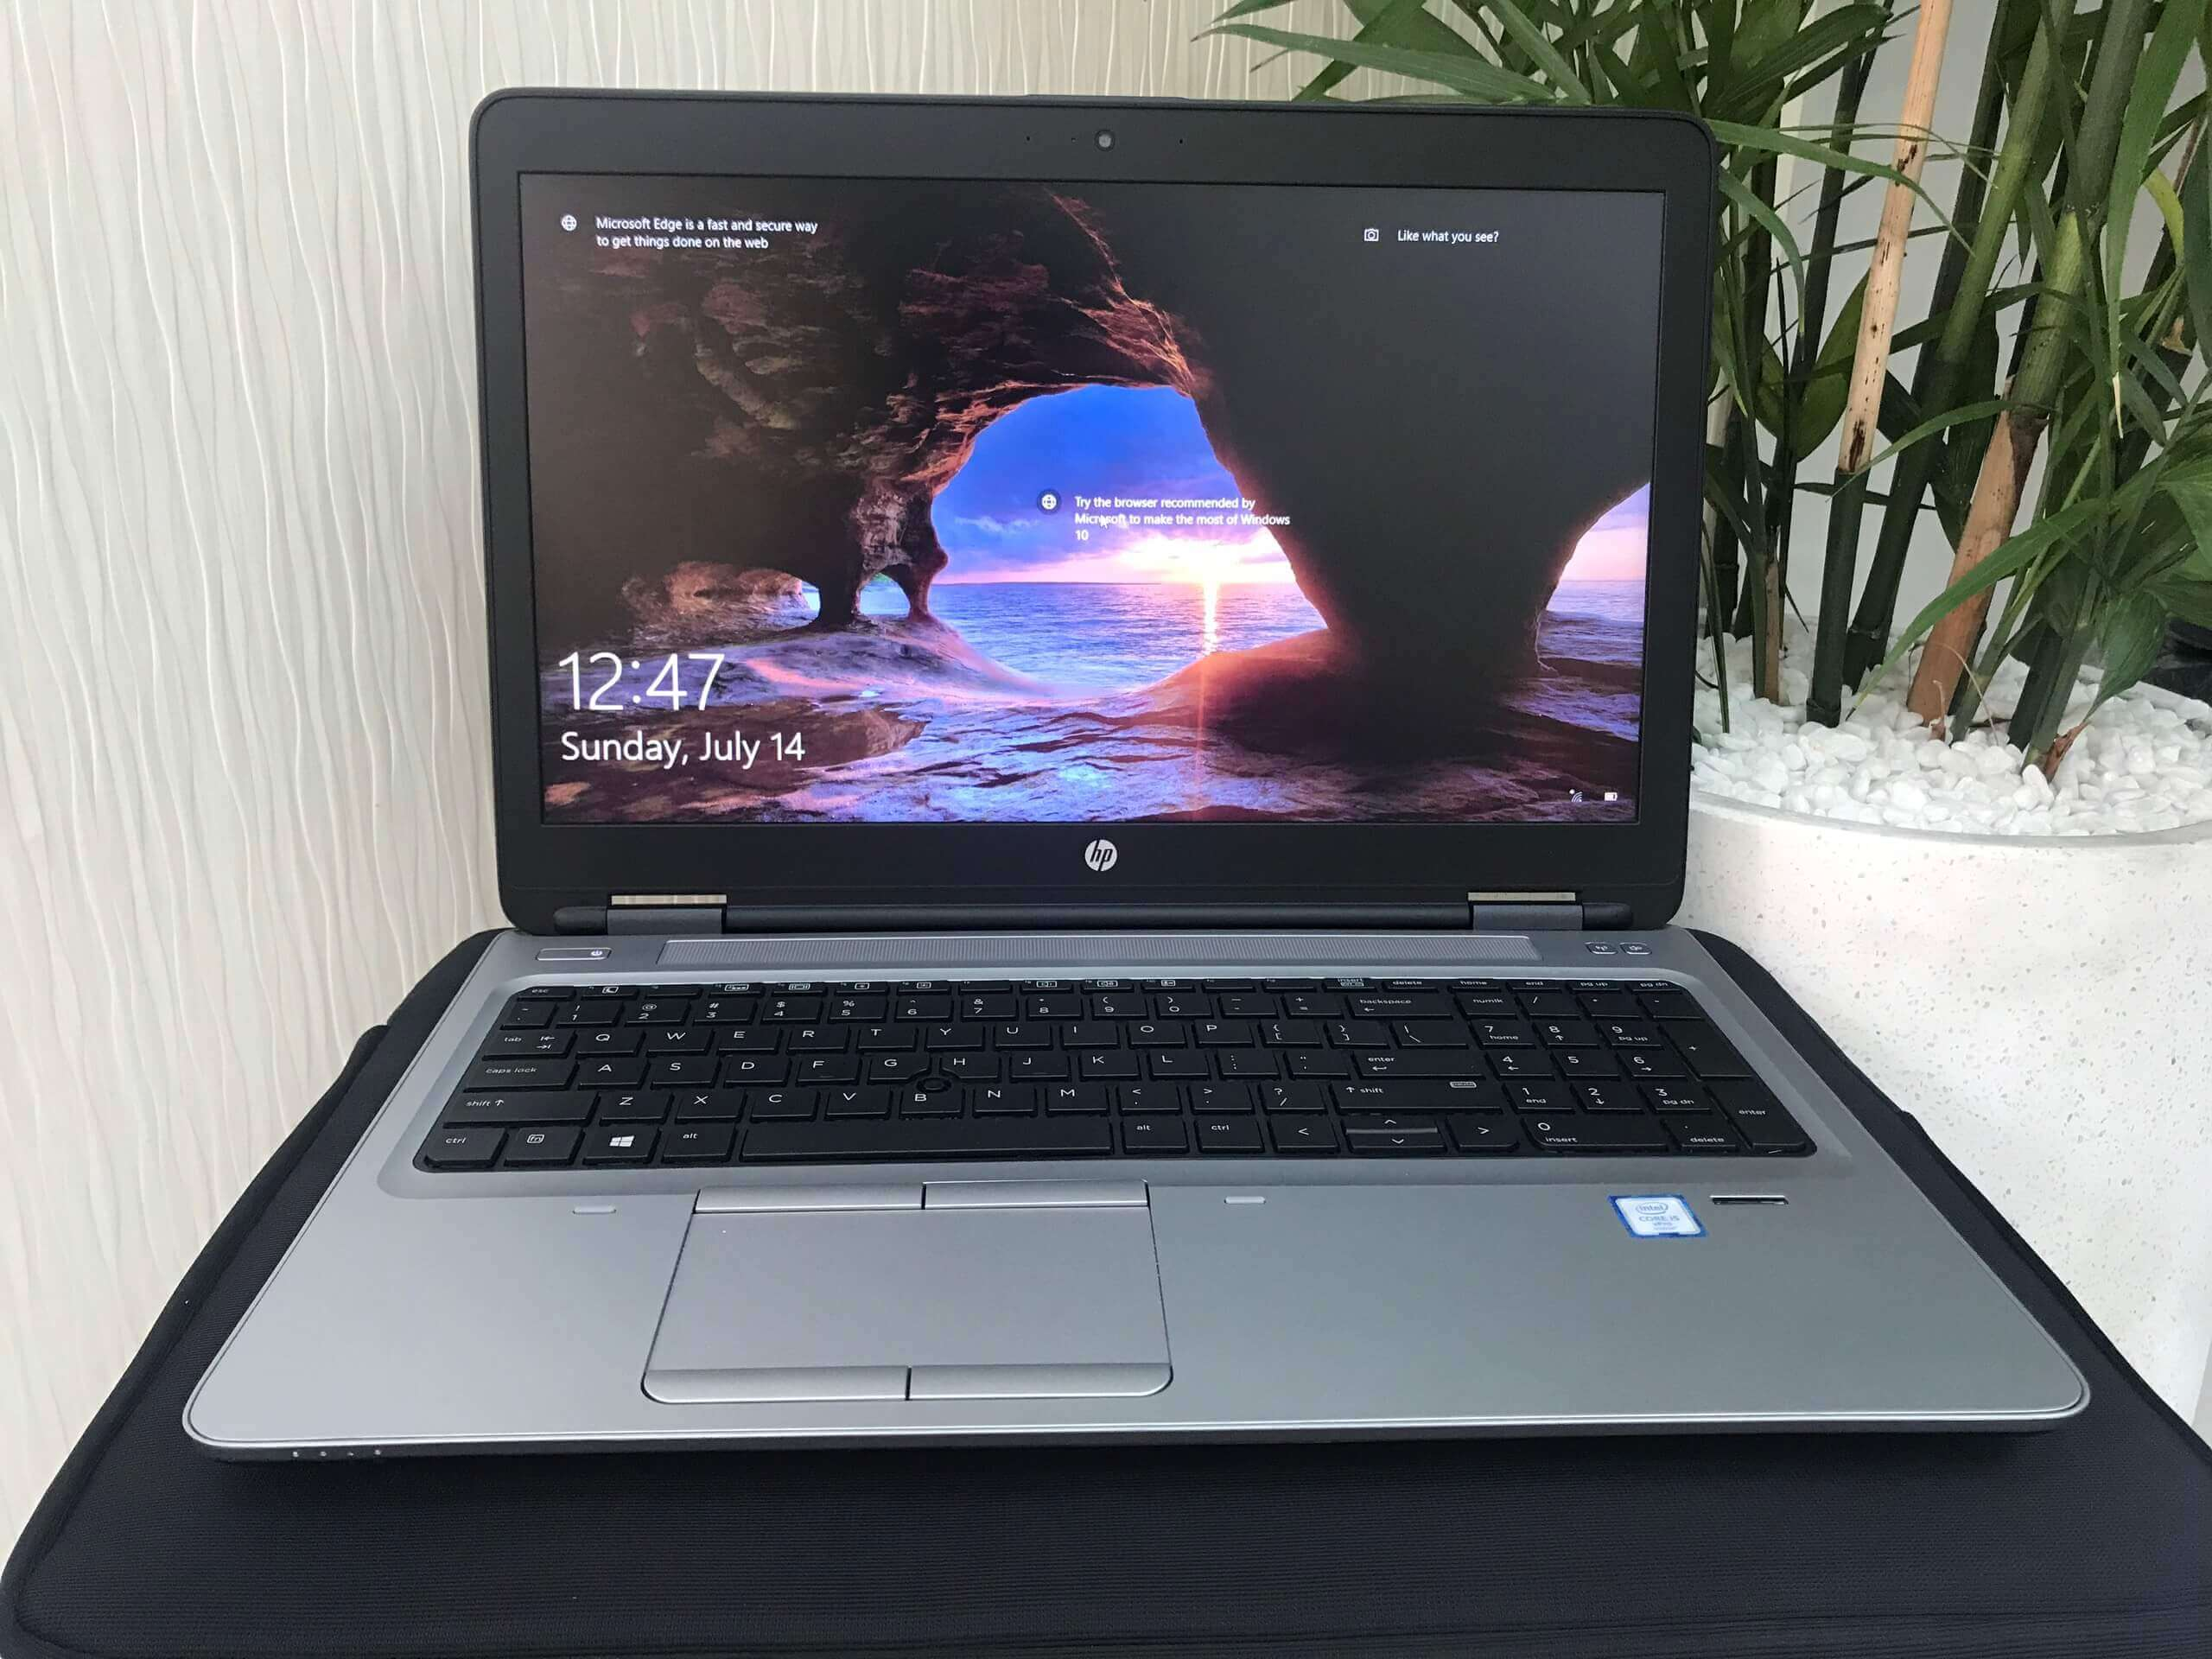 LAPTOP Probook  650 G2, Core i5- cũ hải phòng